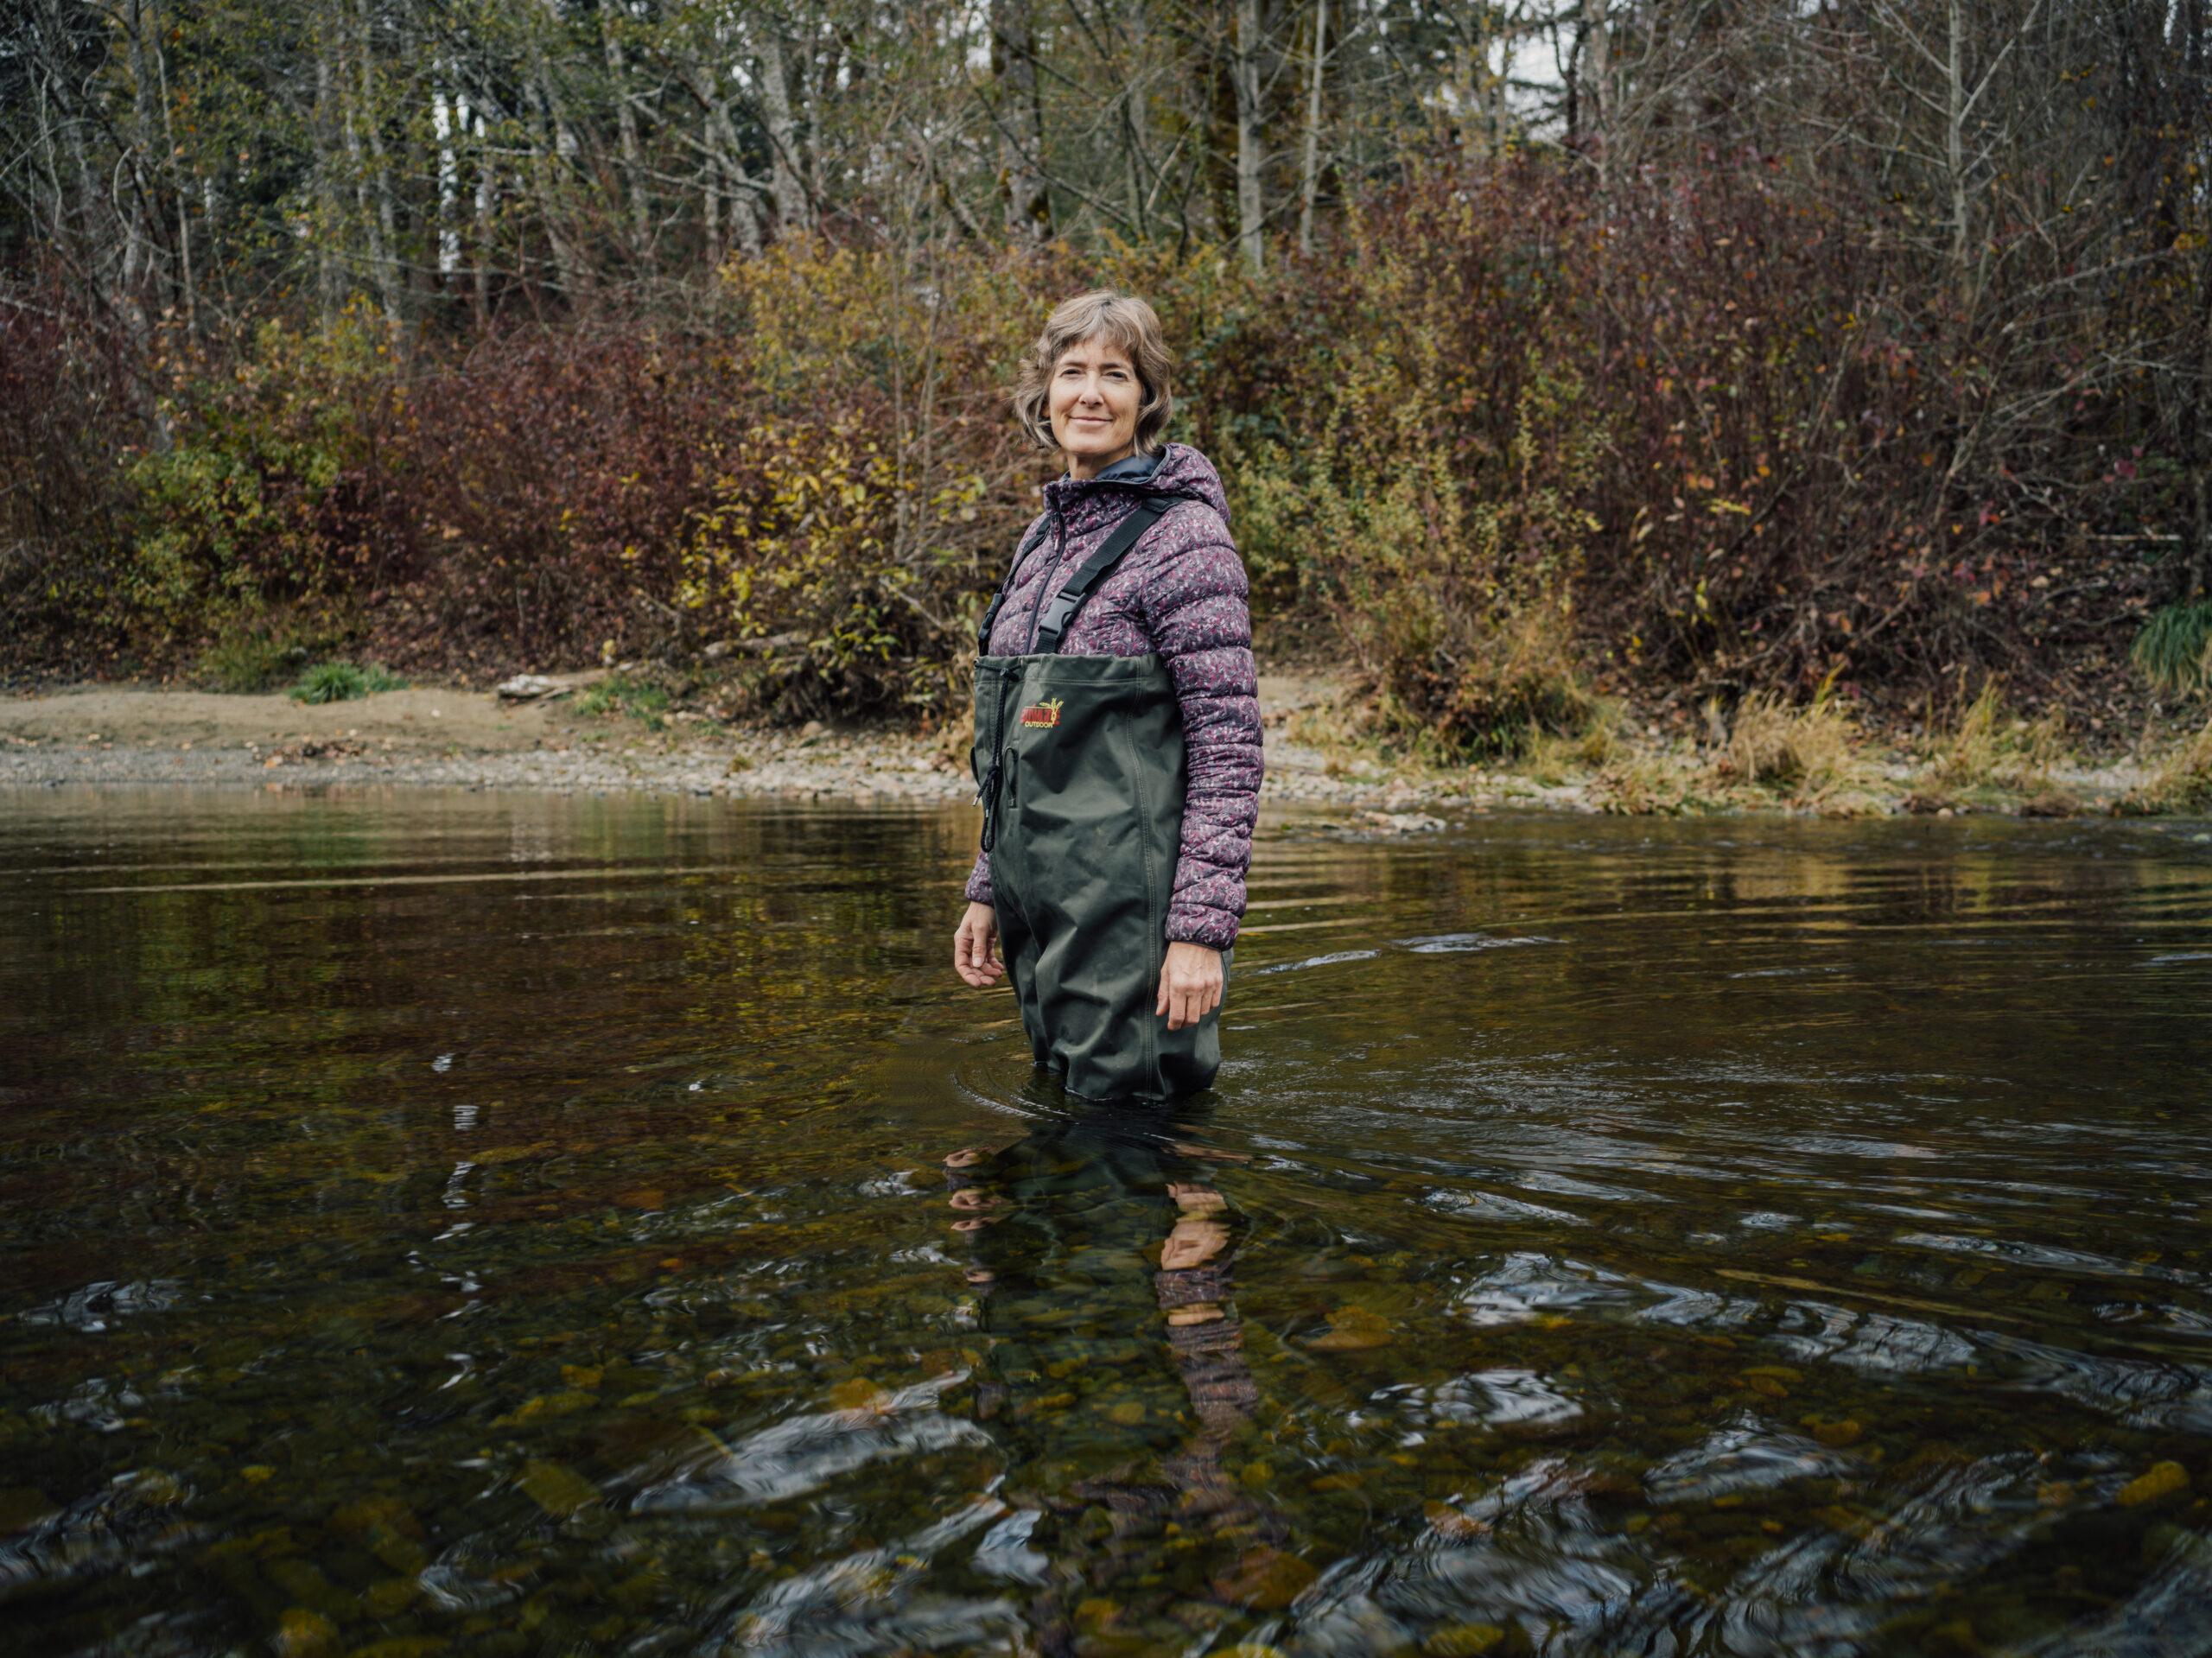 Caroline Hiem stands in hip waders in river